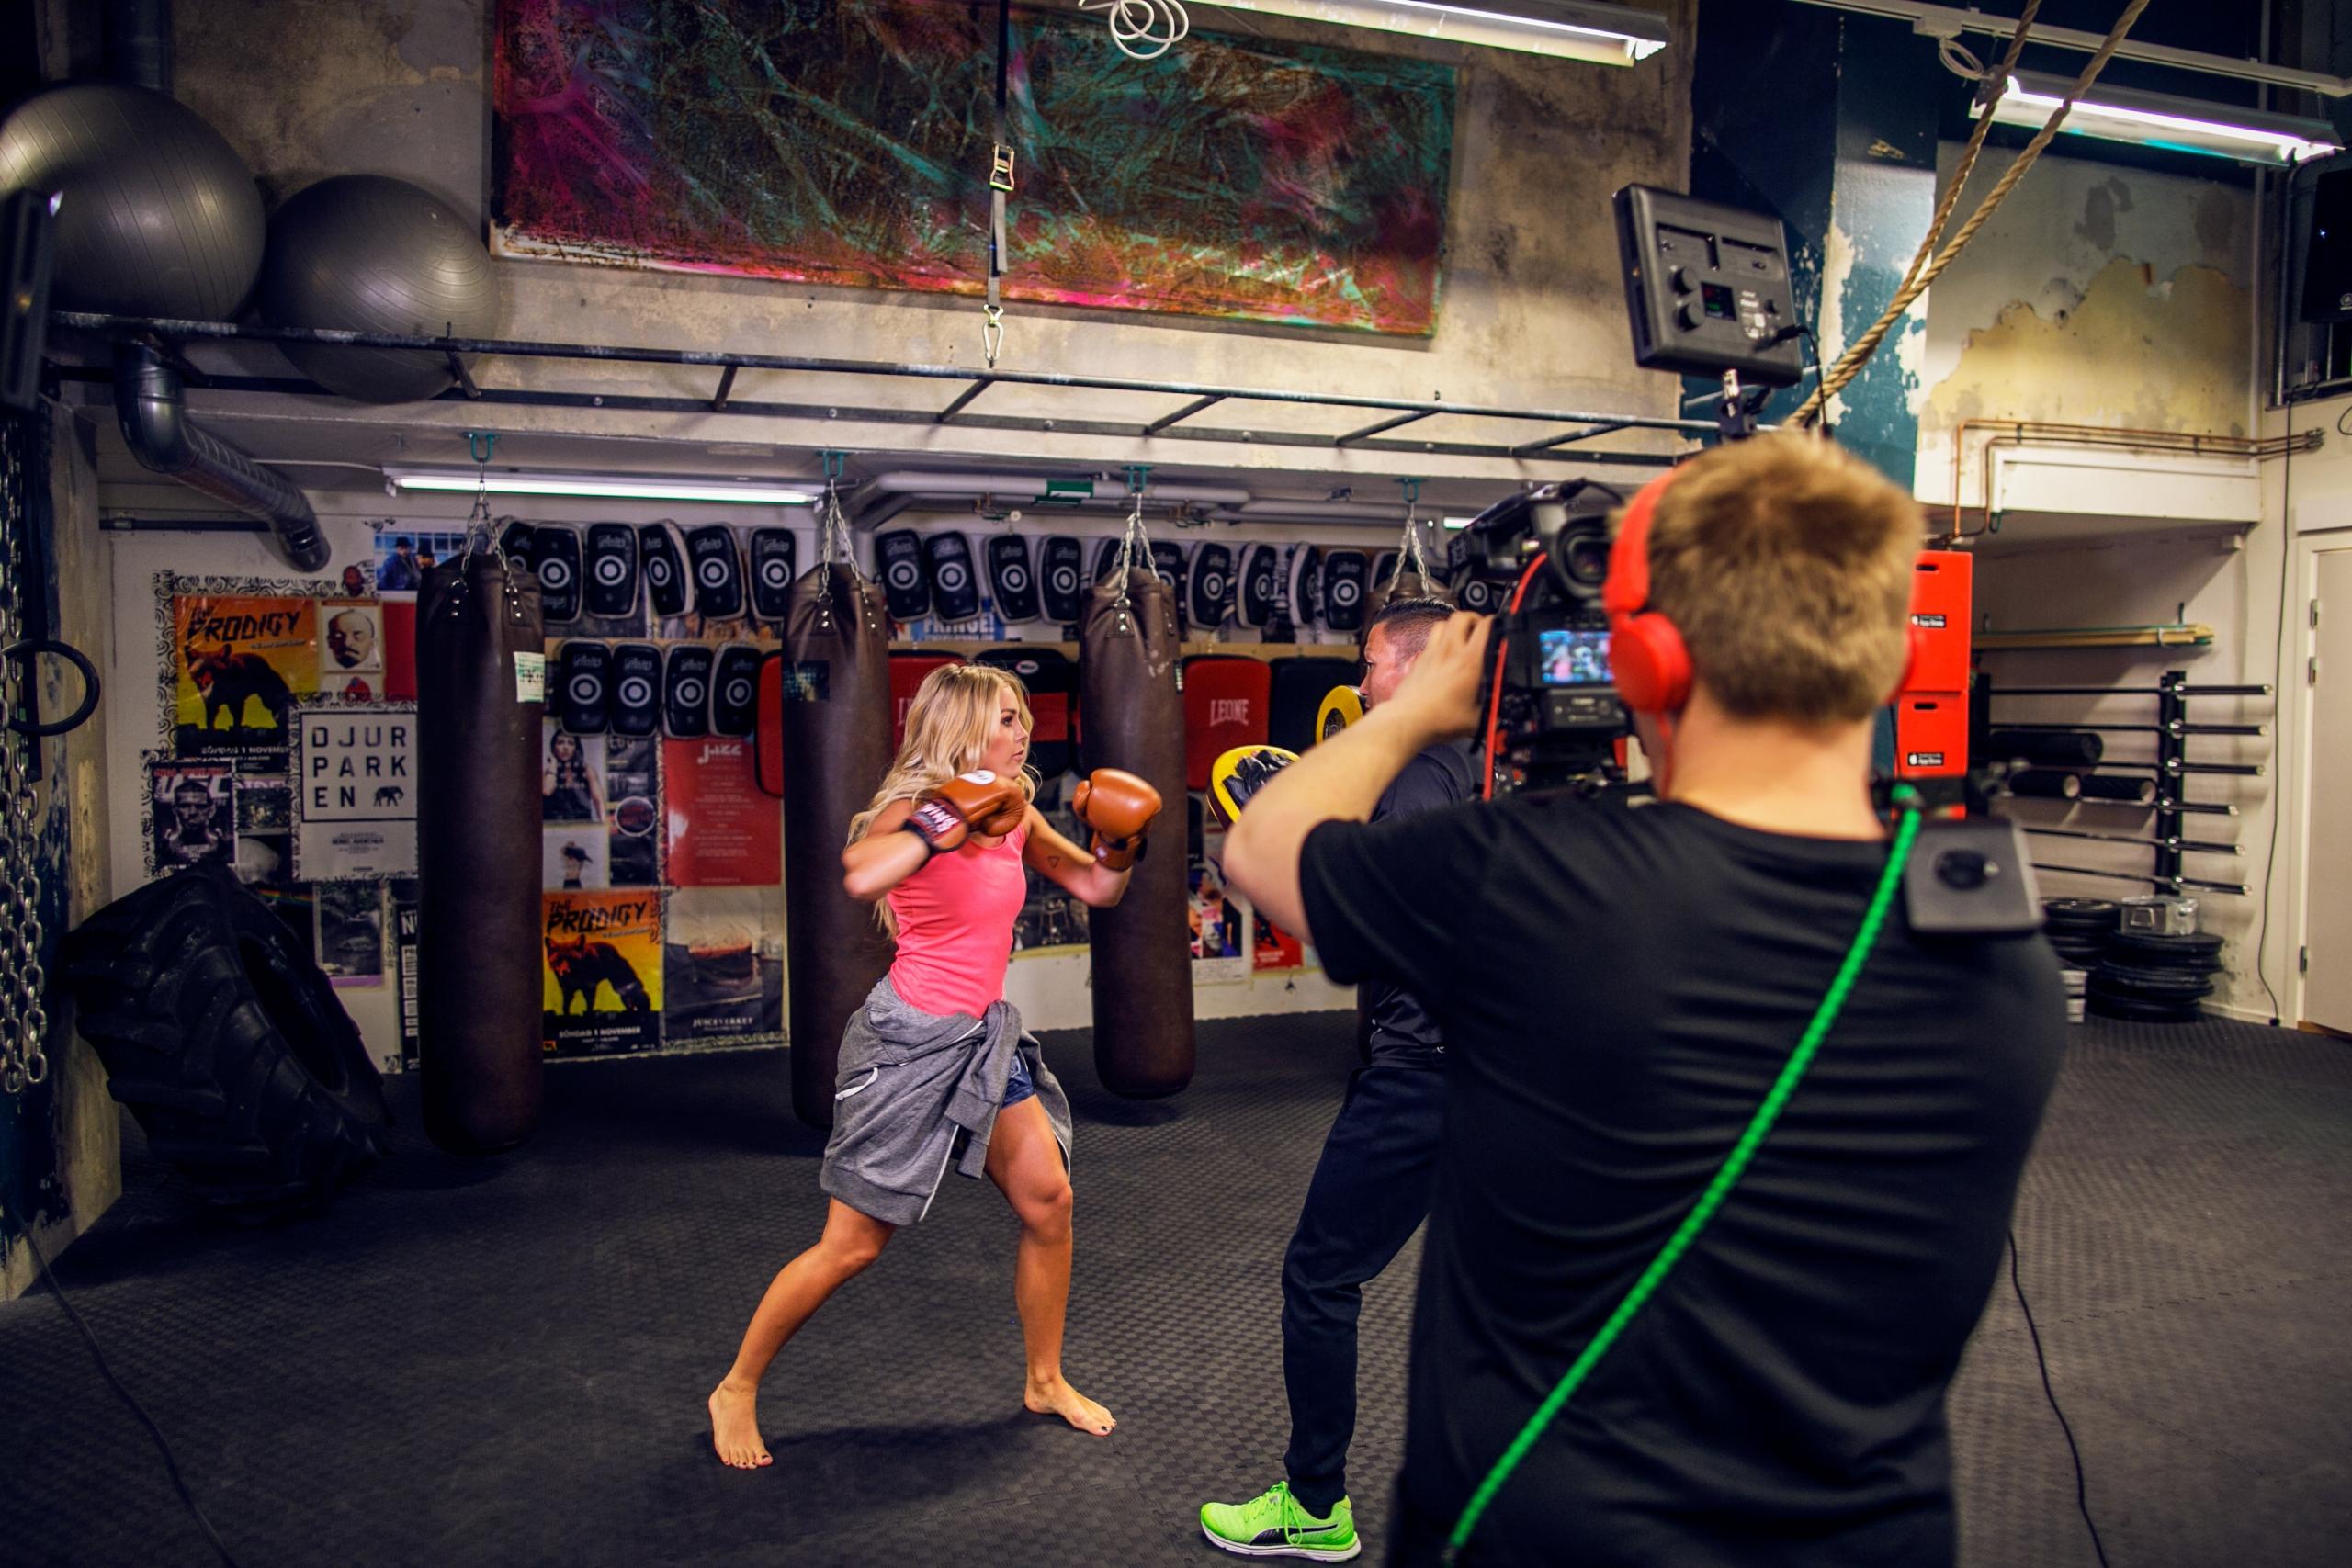 thaiboxning i stockholm